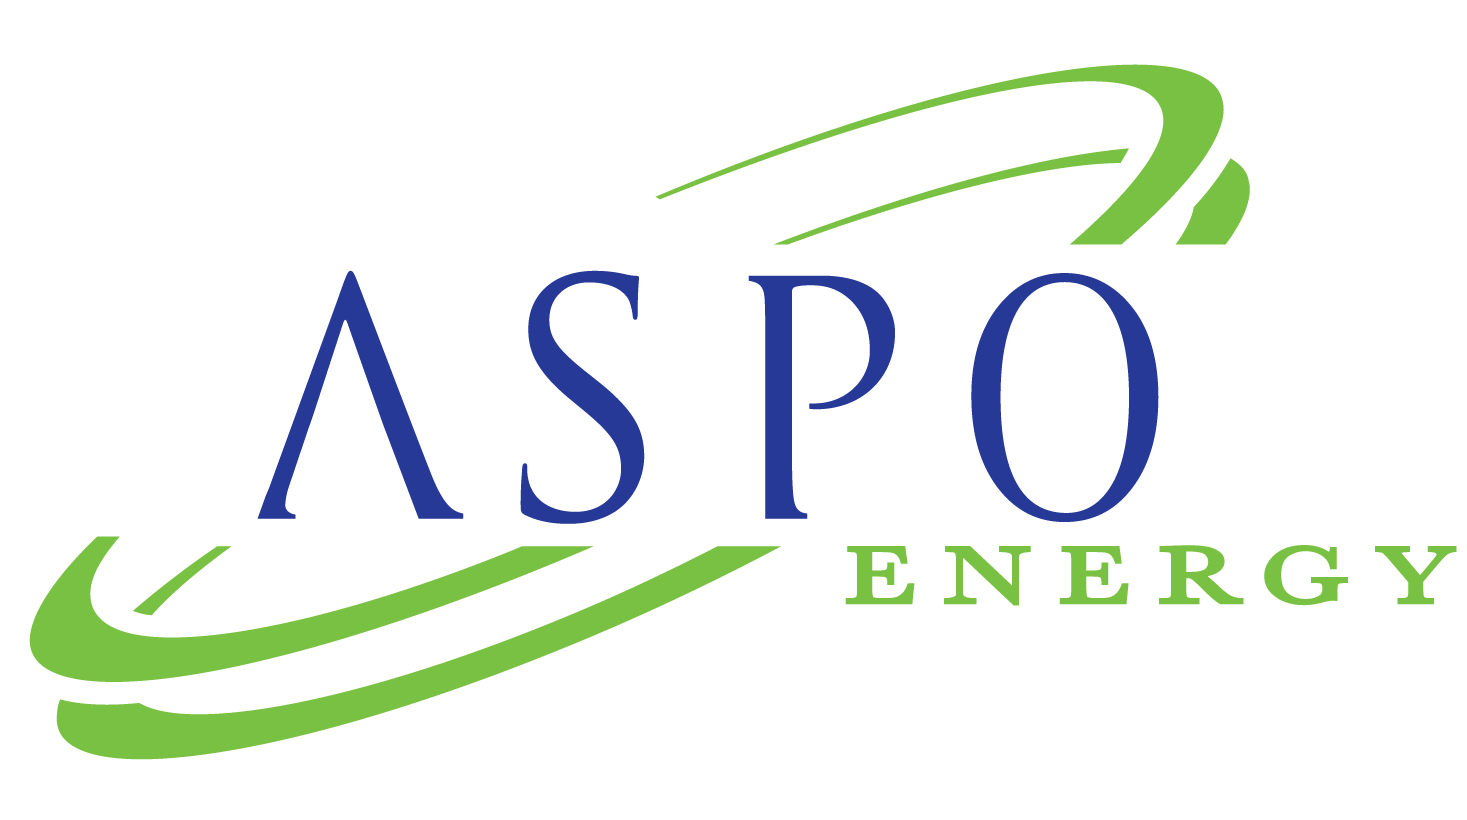 ASPO Energy Ltd.